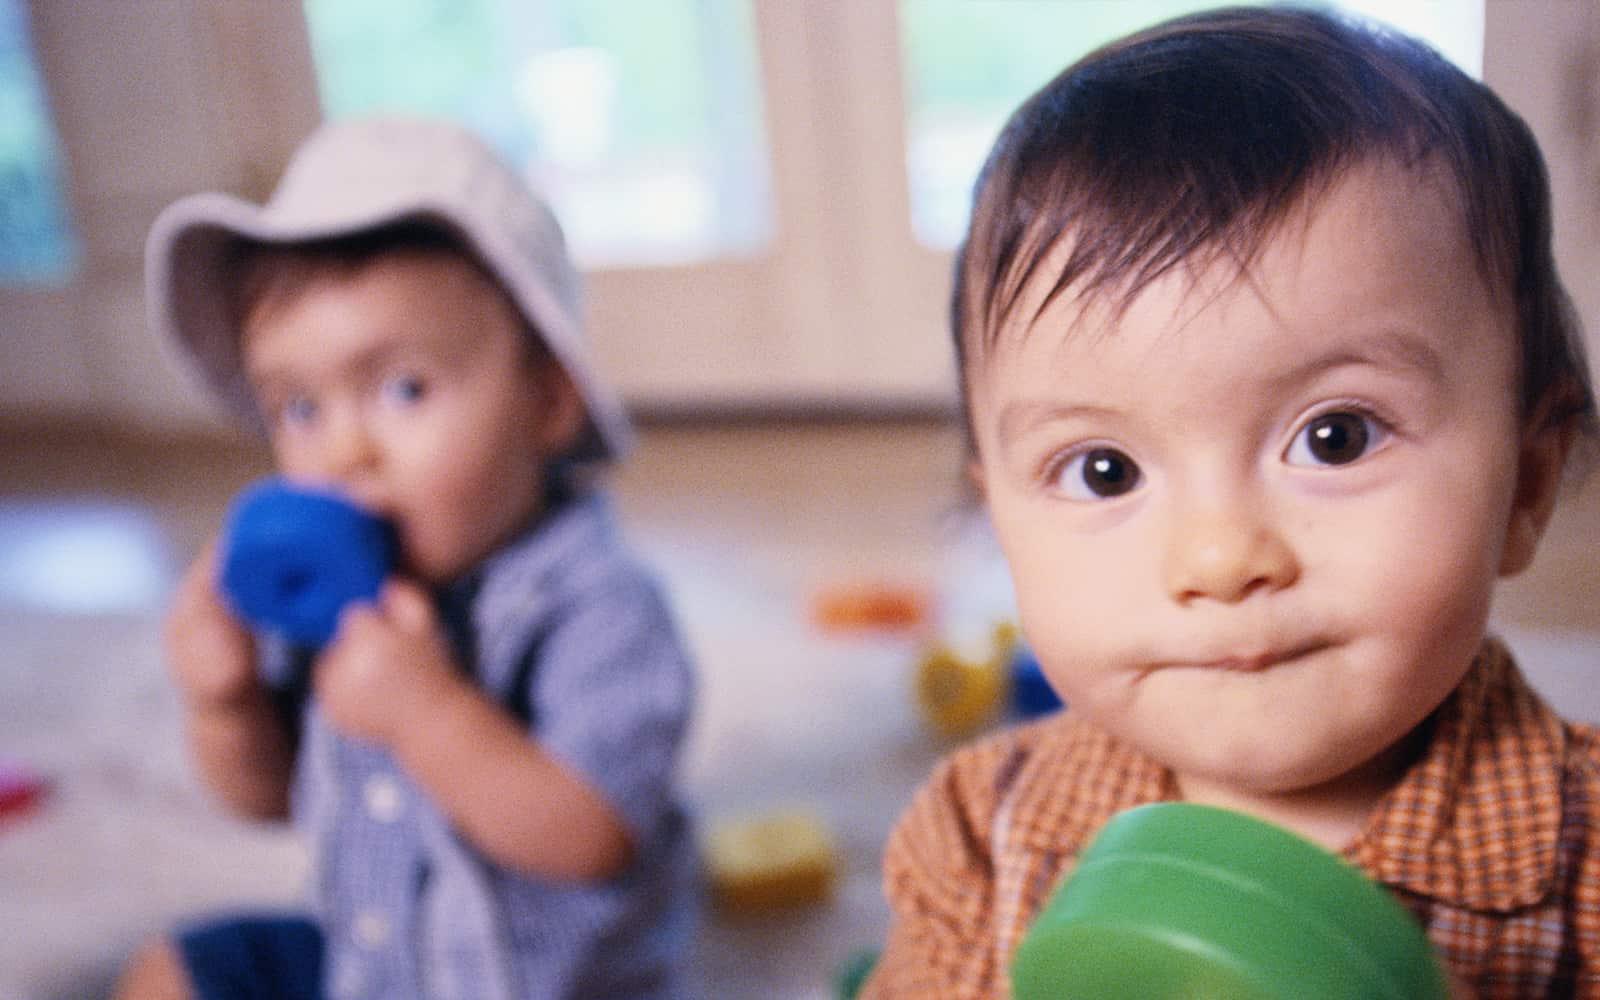 Little boy in orange shirt with green toy